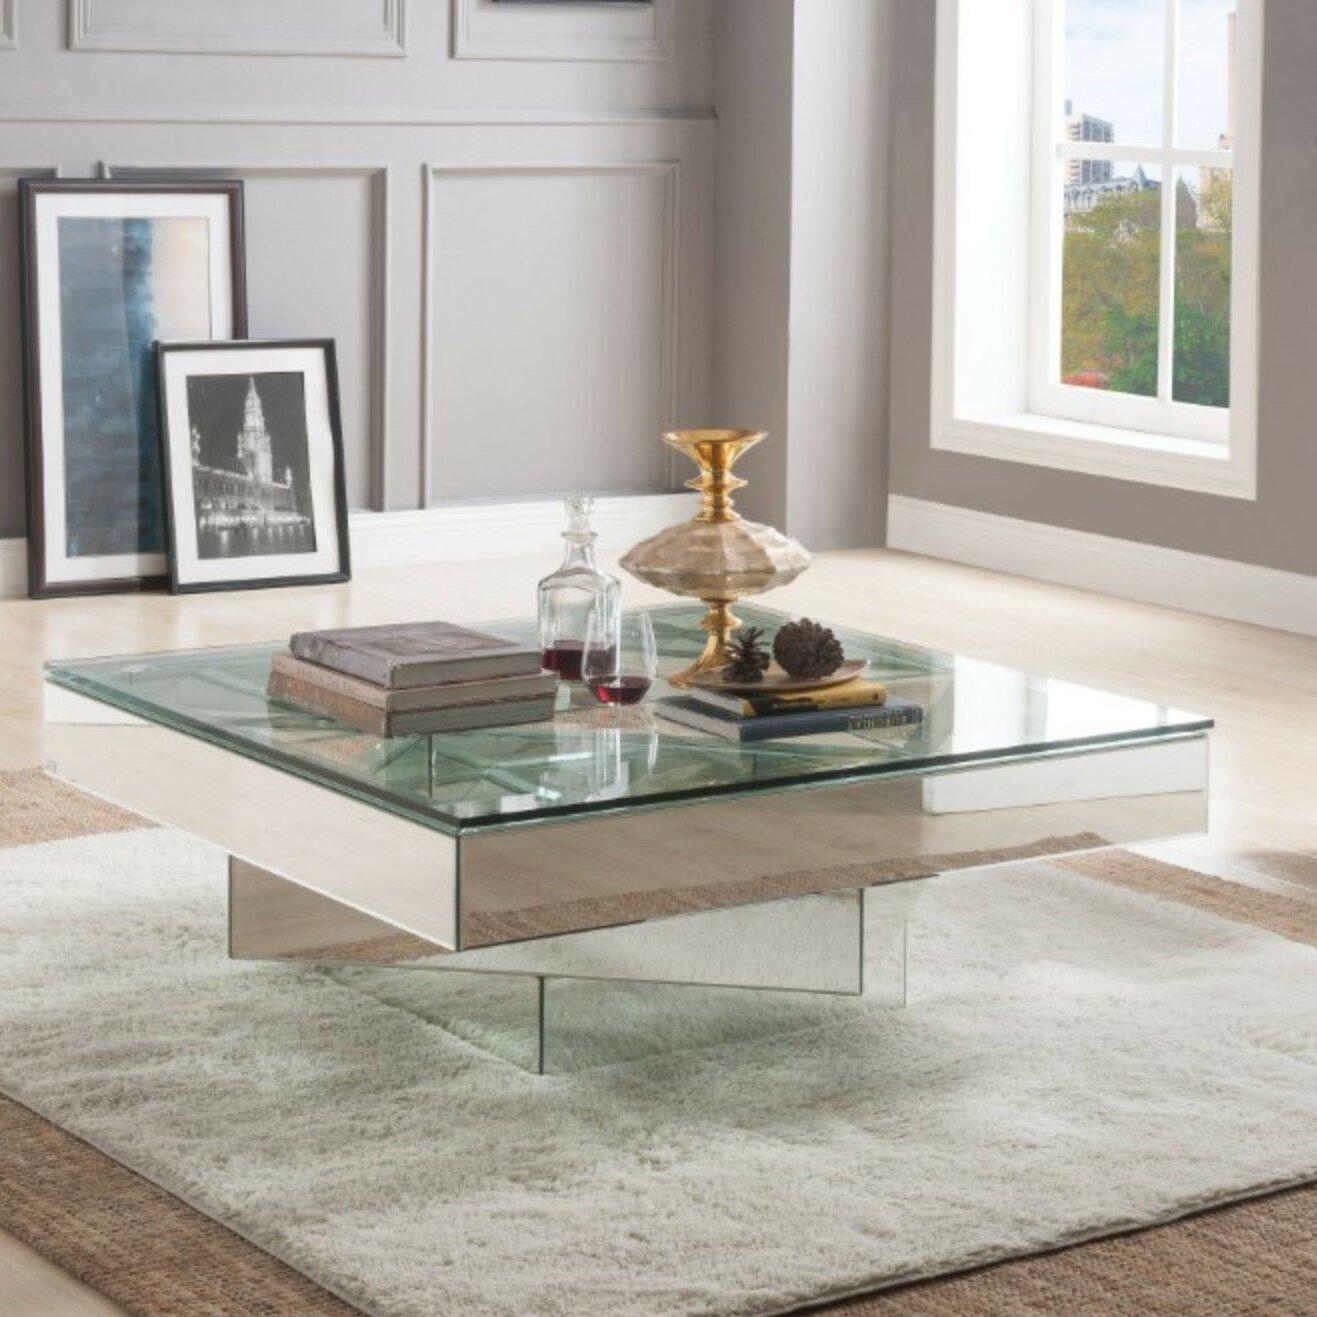 ulibarri modern square glass and mirror coffee table